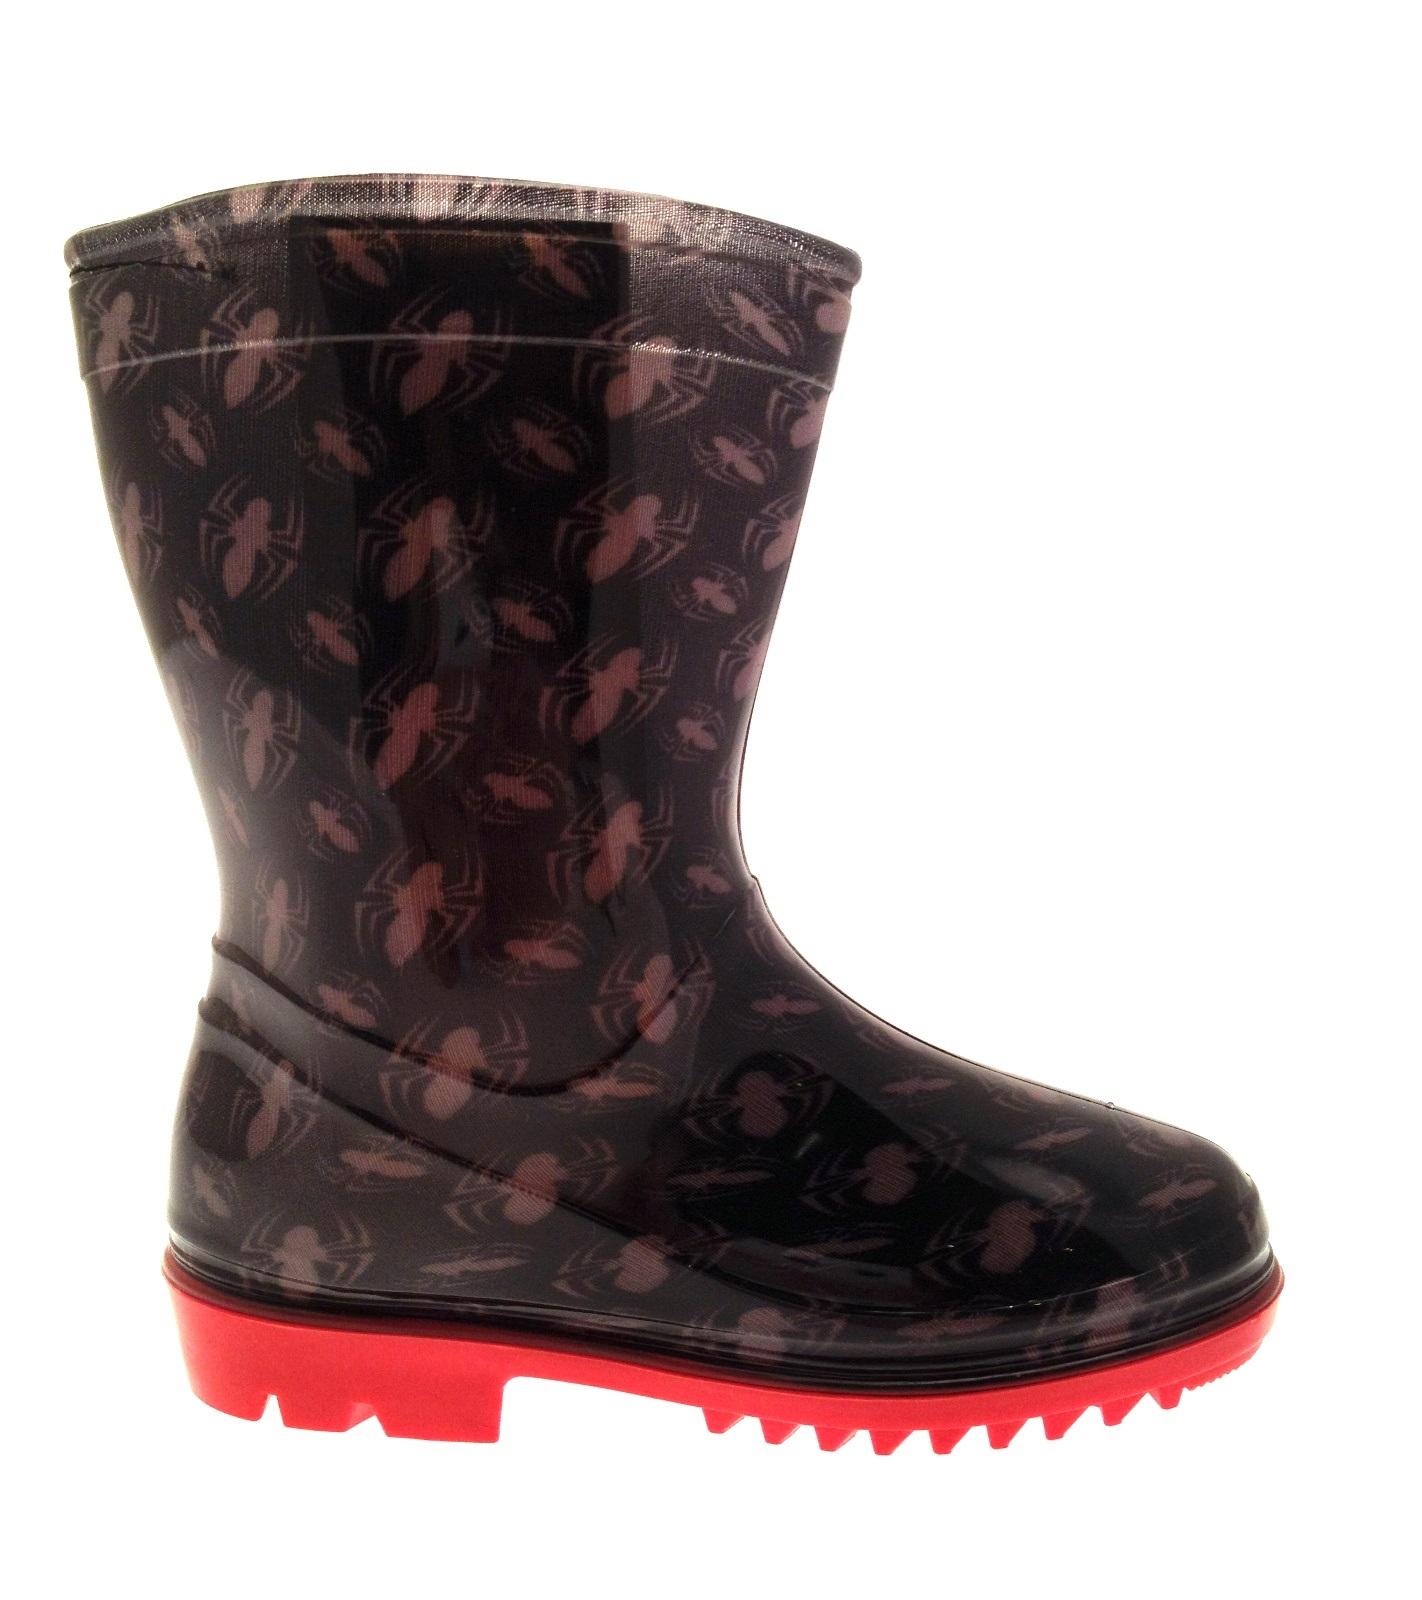 Boys marvel spiderman snow winter boots wellies wellingtons black size